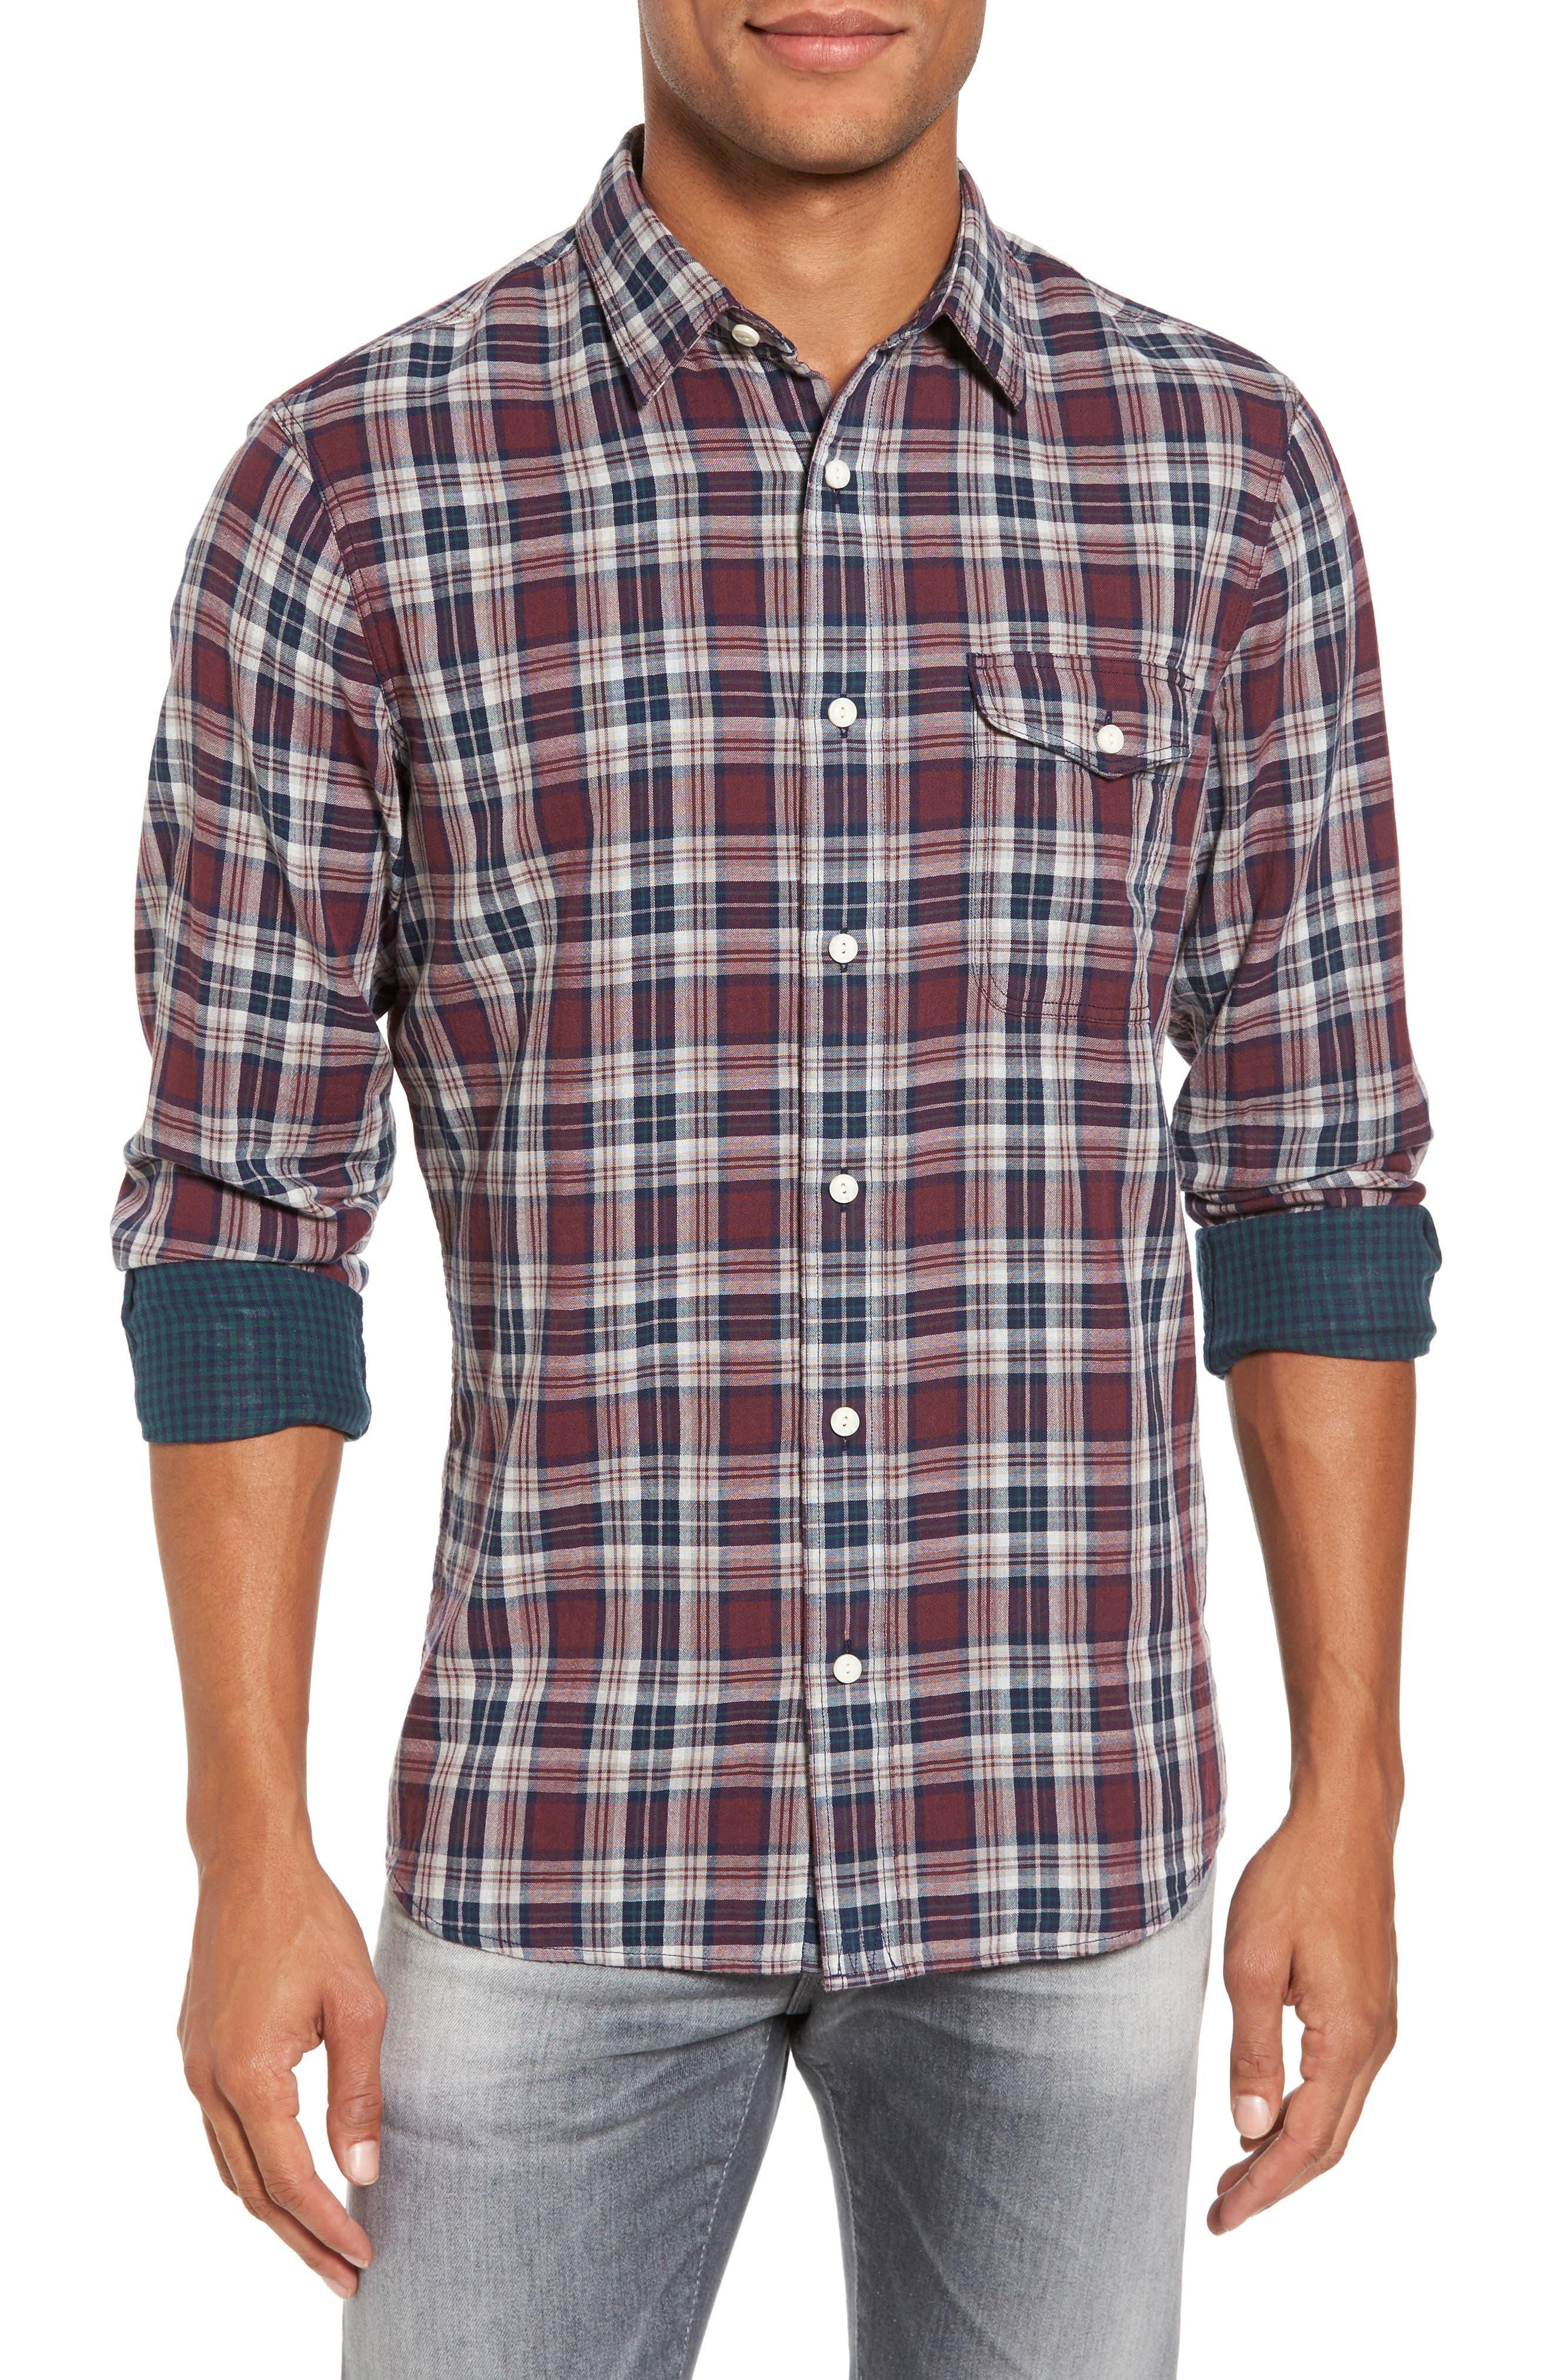 Nordstrom Men's Shop Lumber Duofold Slim Fit Plaid Shirt